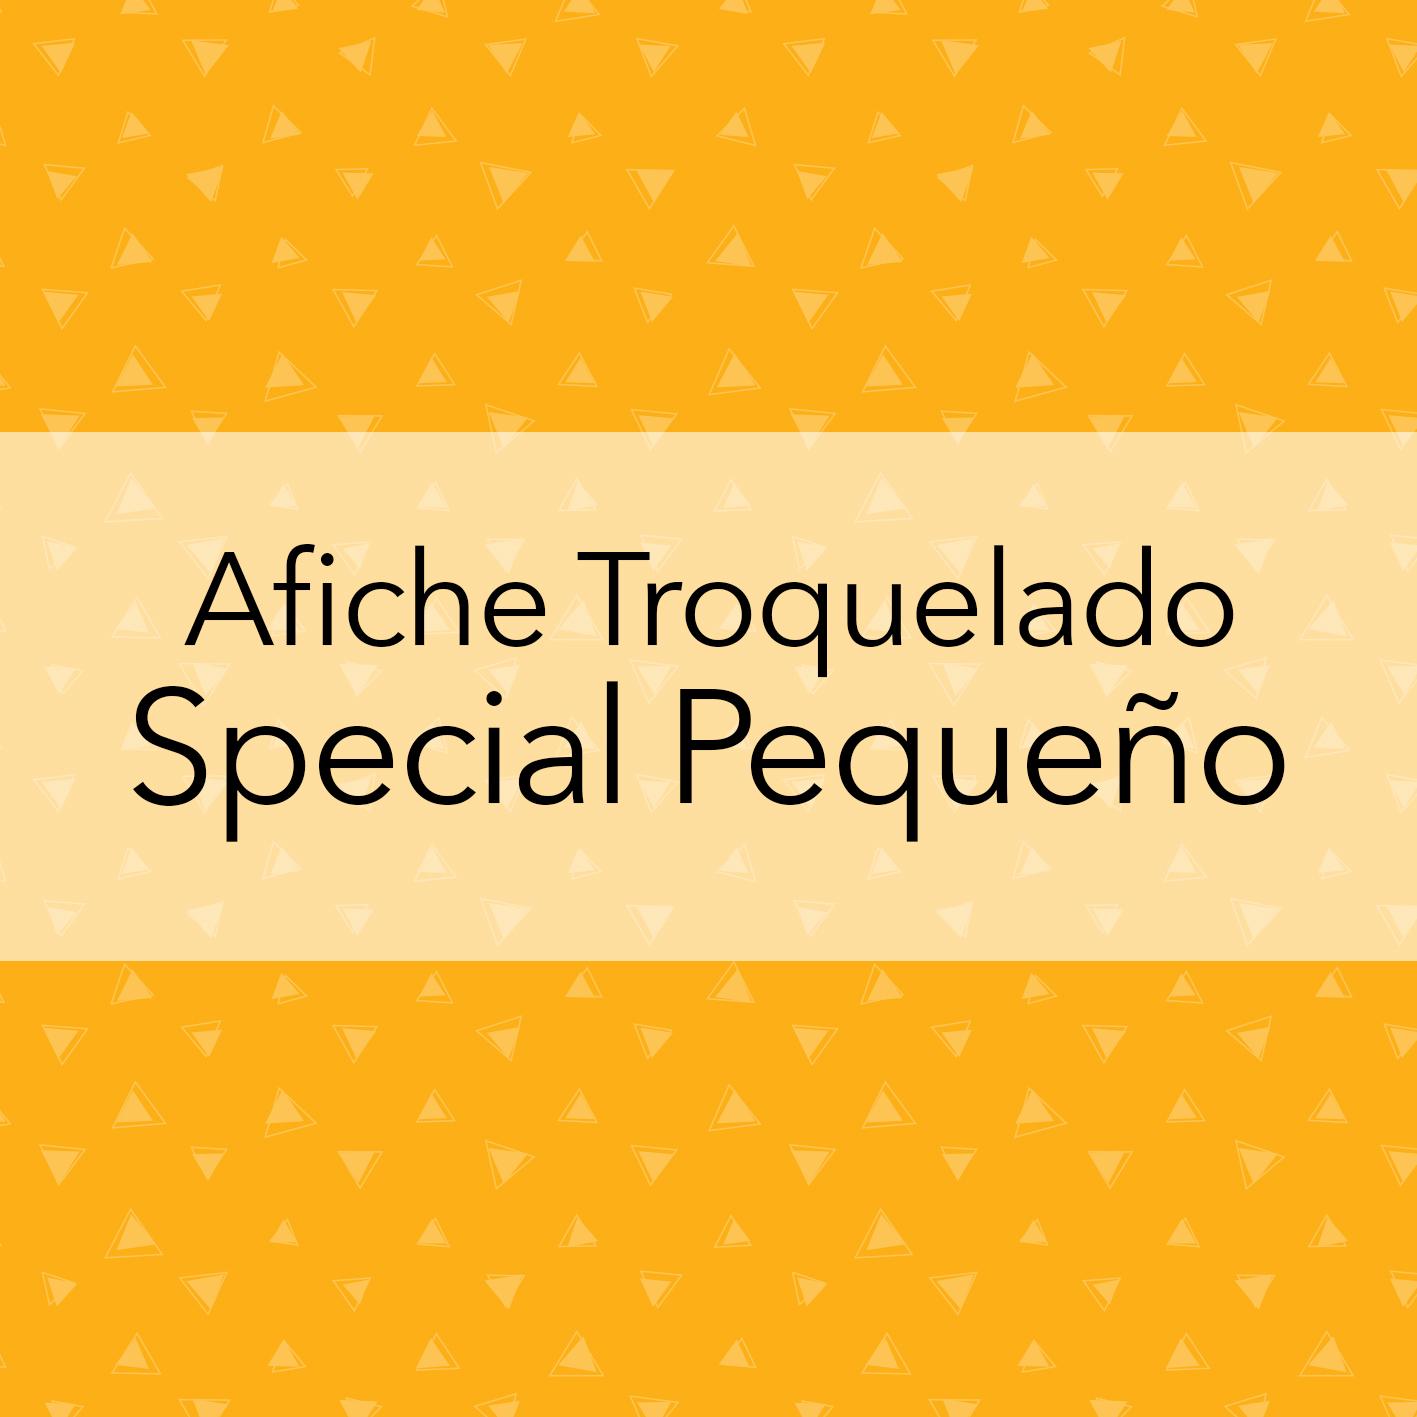 AFICHE TROQUELADO SPECIAL PEQUEÑO